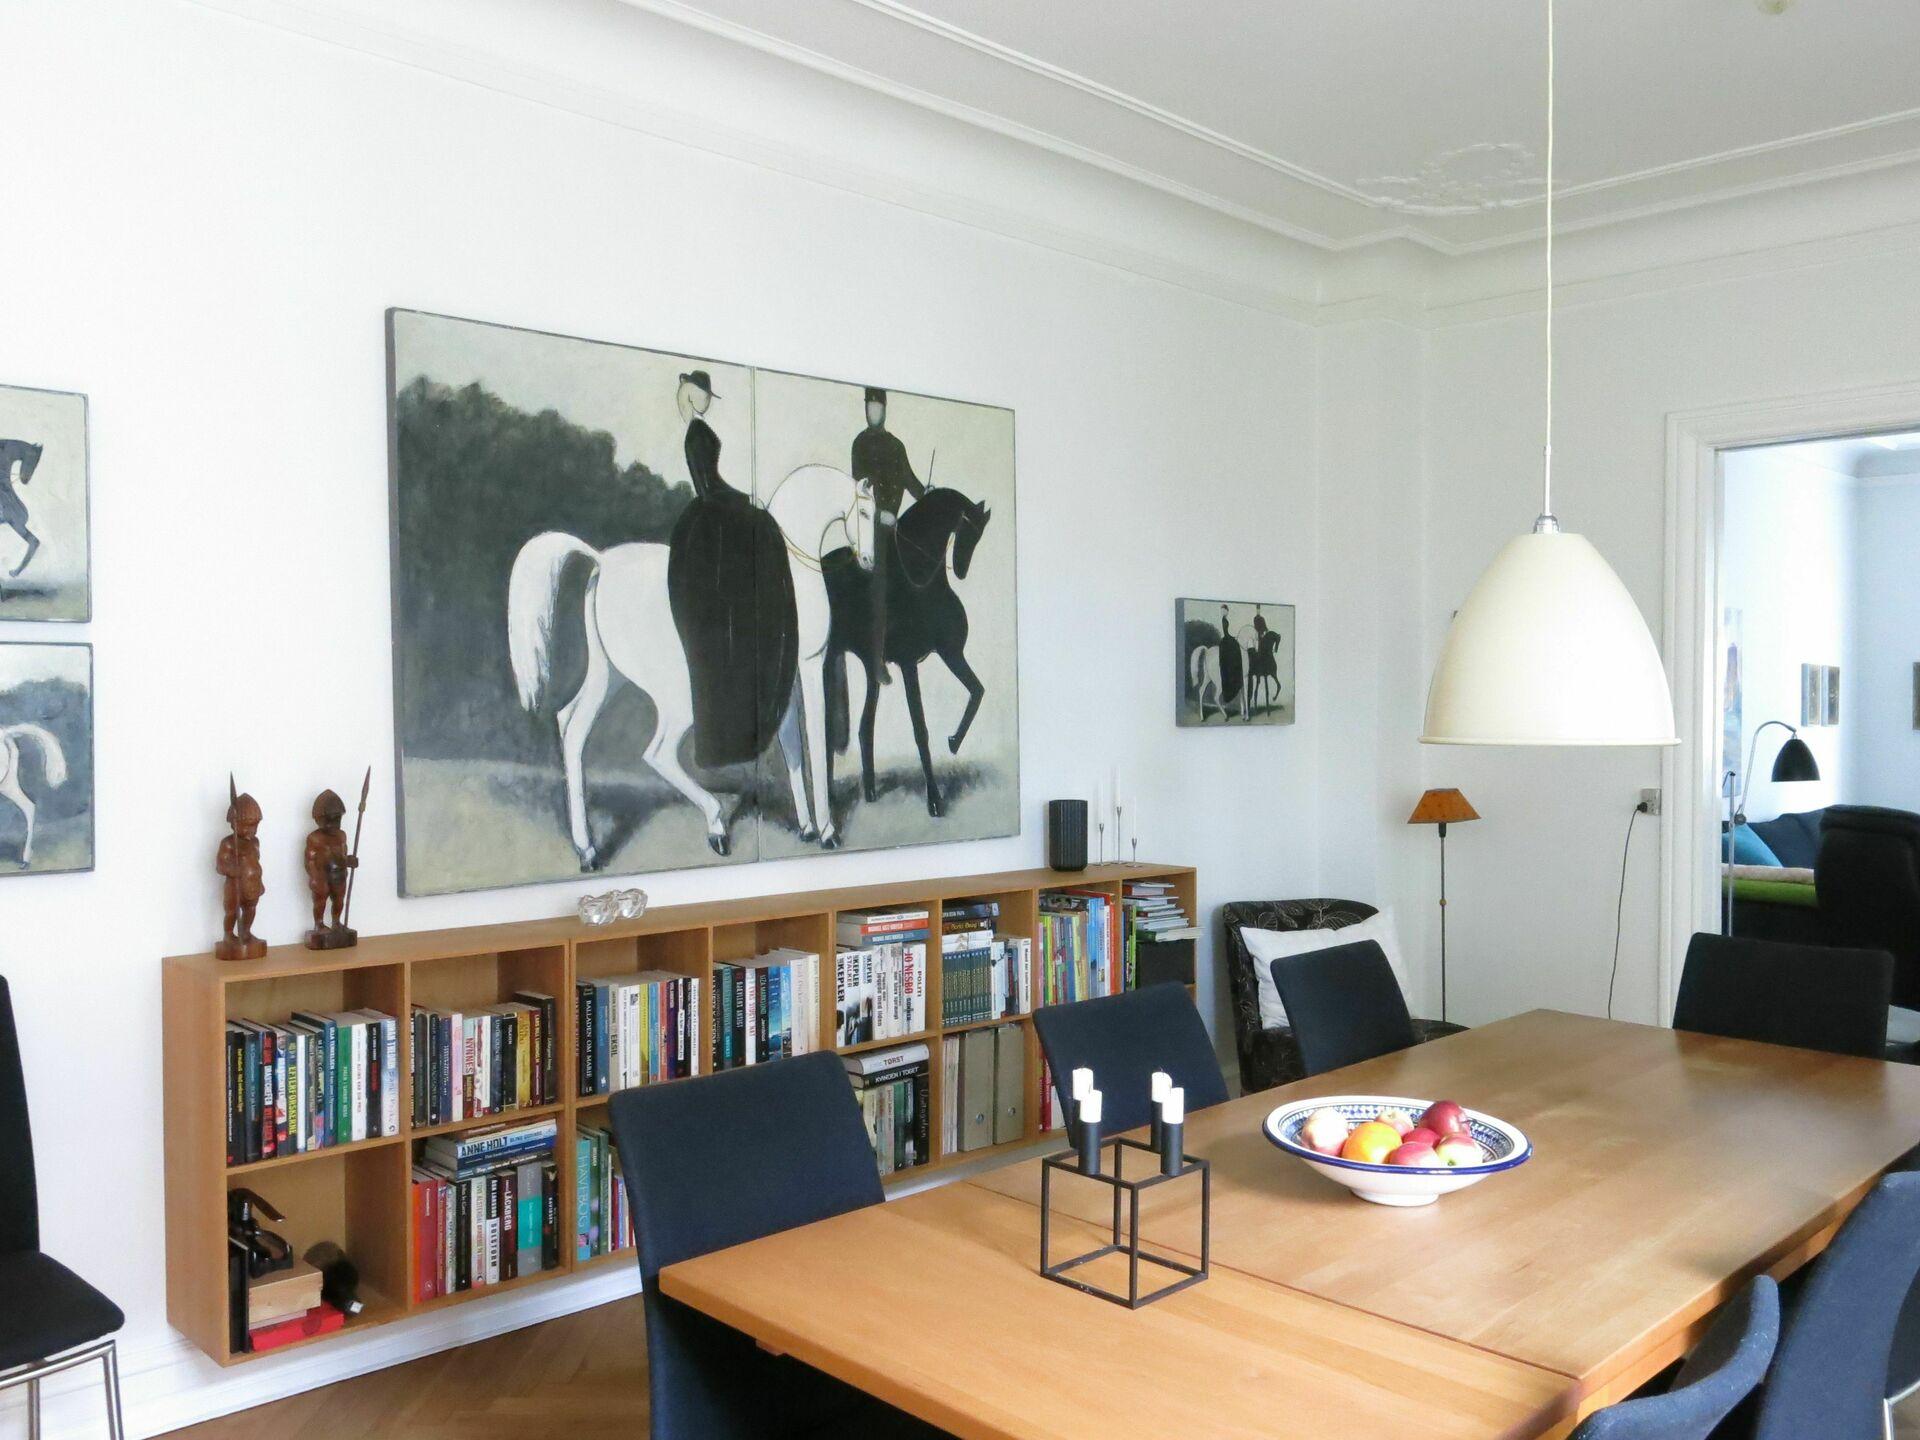 Kopenhagen Wohnung frederiksberg 3 bedrooms wohnung in kopenhagen